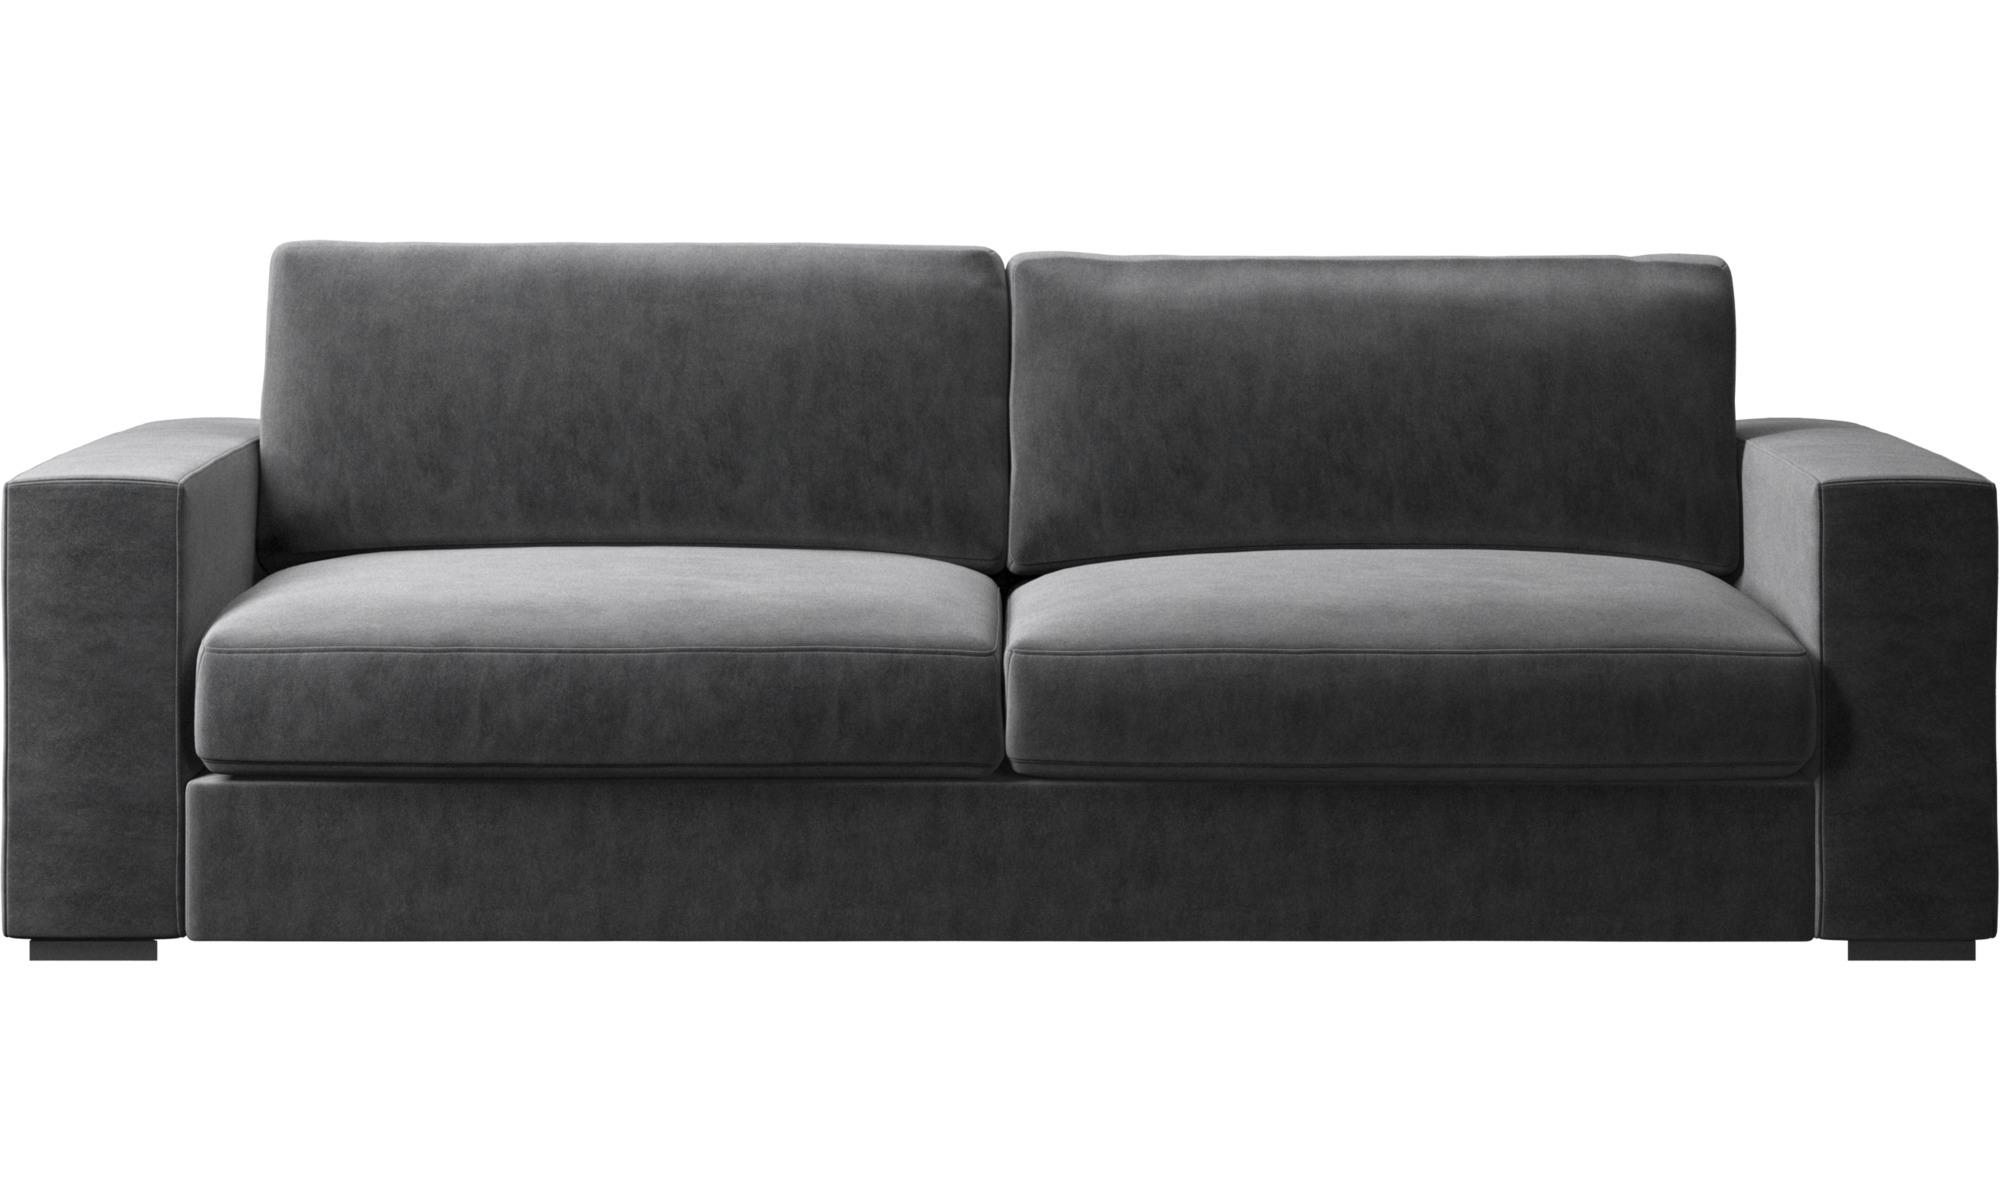 3 Seater Sofas Cenova Divano Boconcept